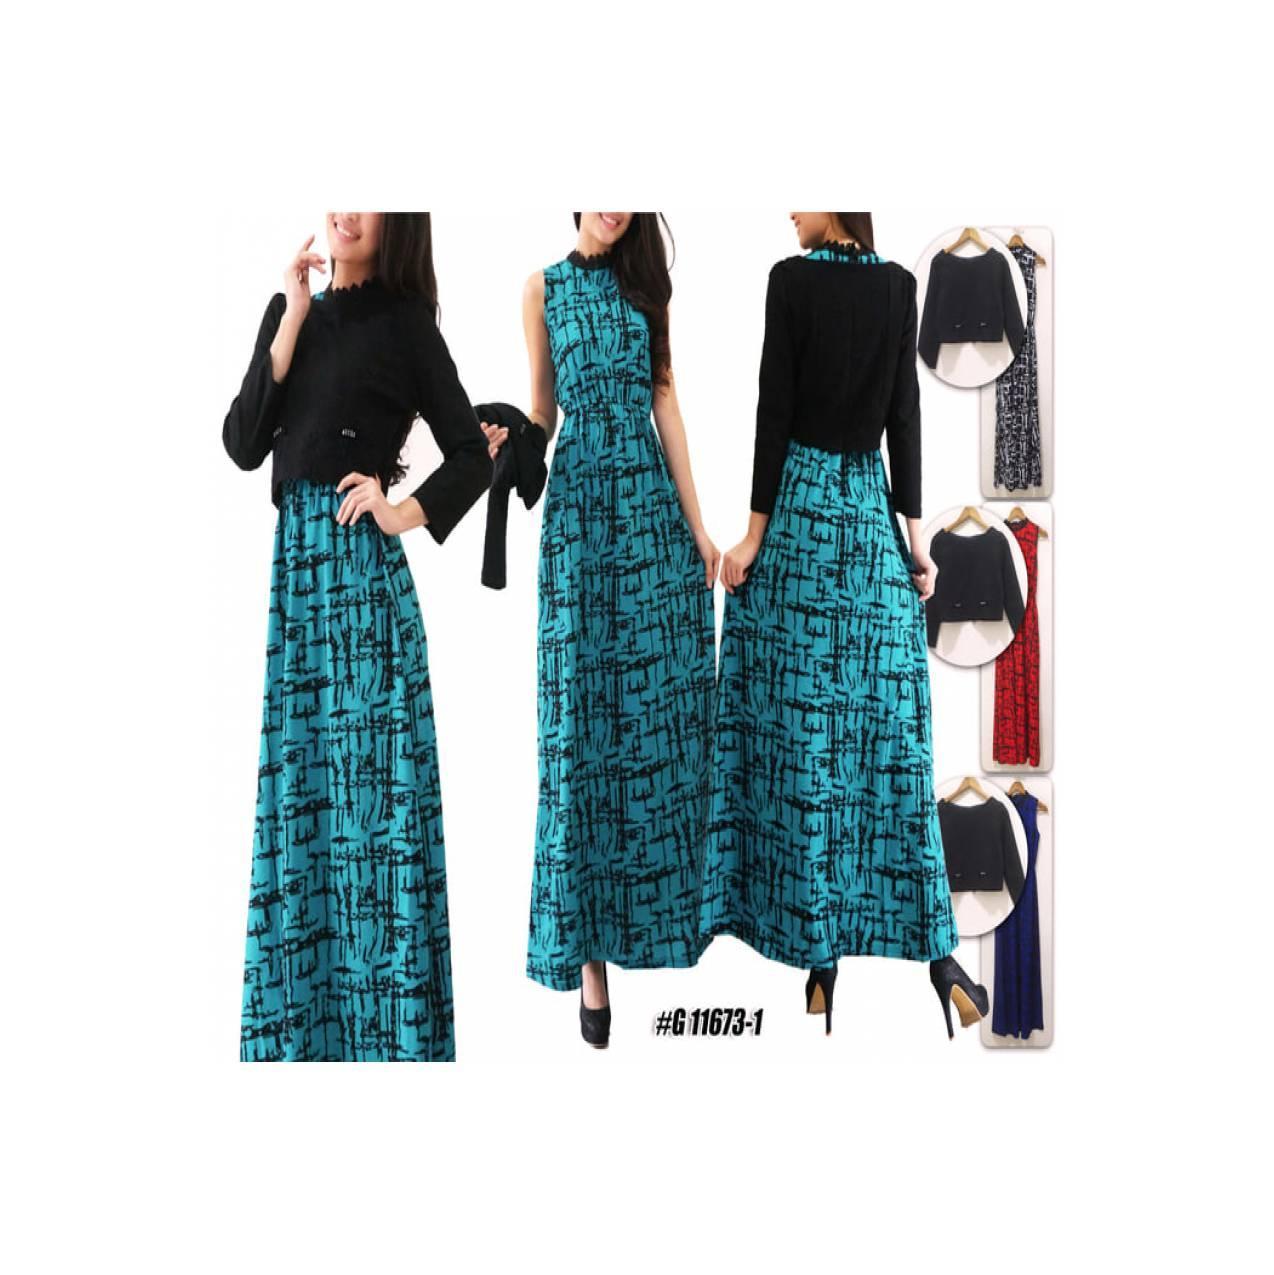 Gamis Maxi Zaskia / Gamis Renda / Dress / Busana Muslim / Brukat Renda